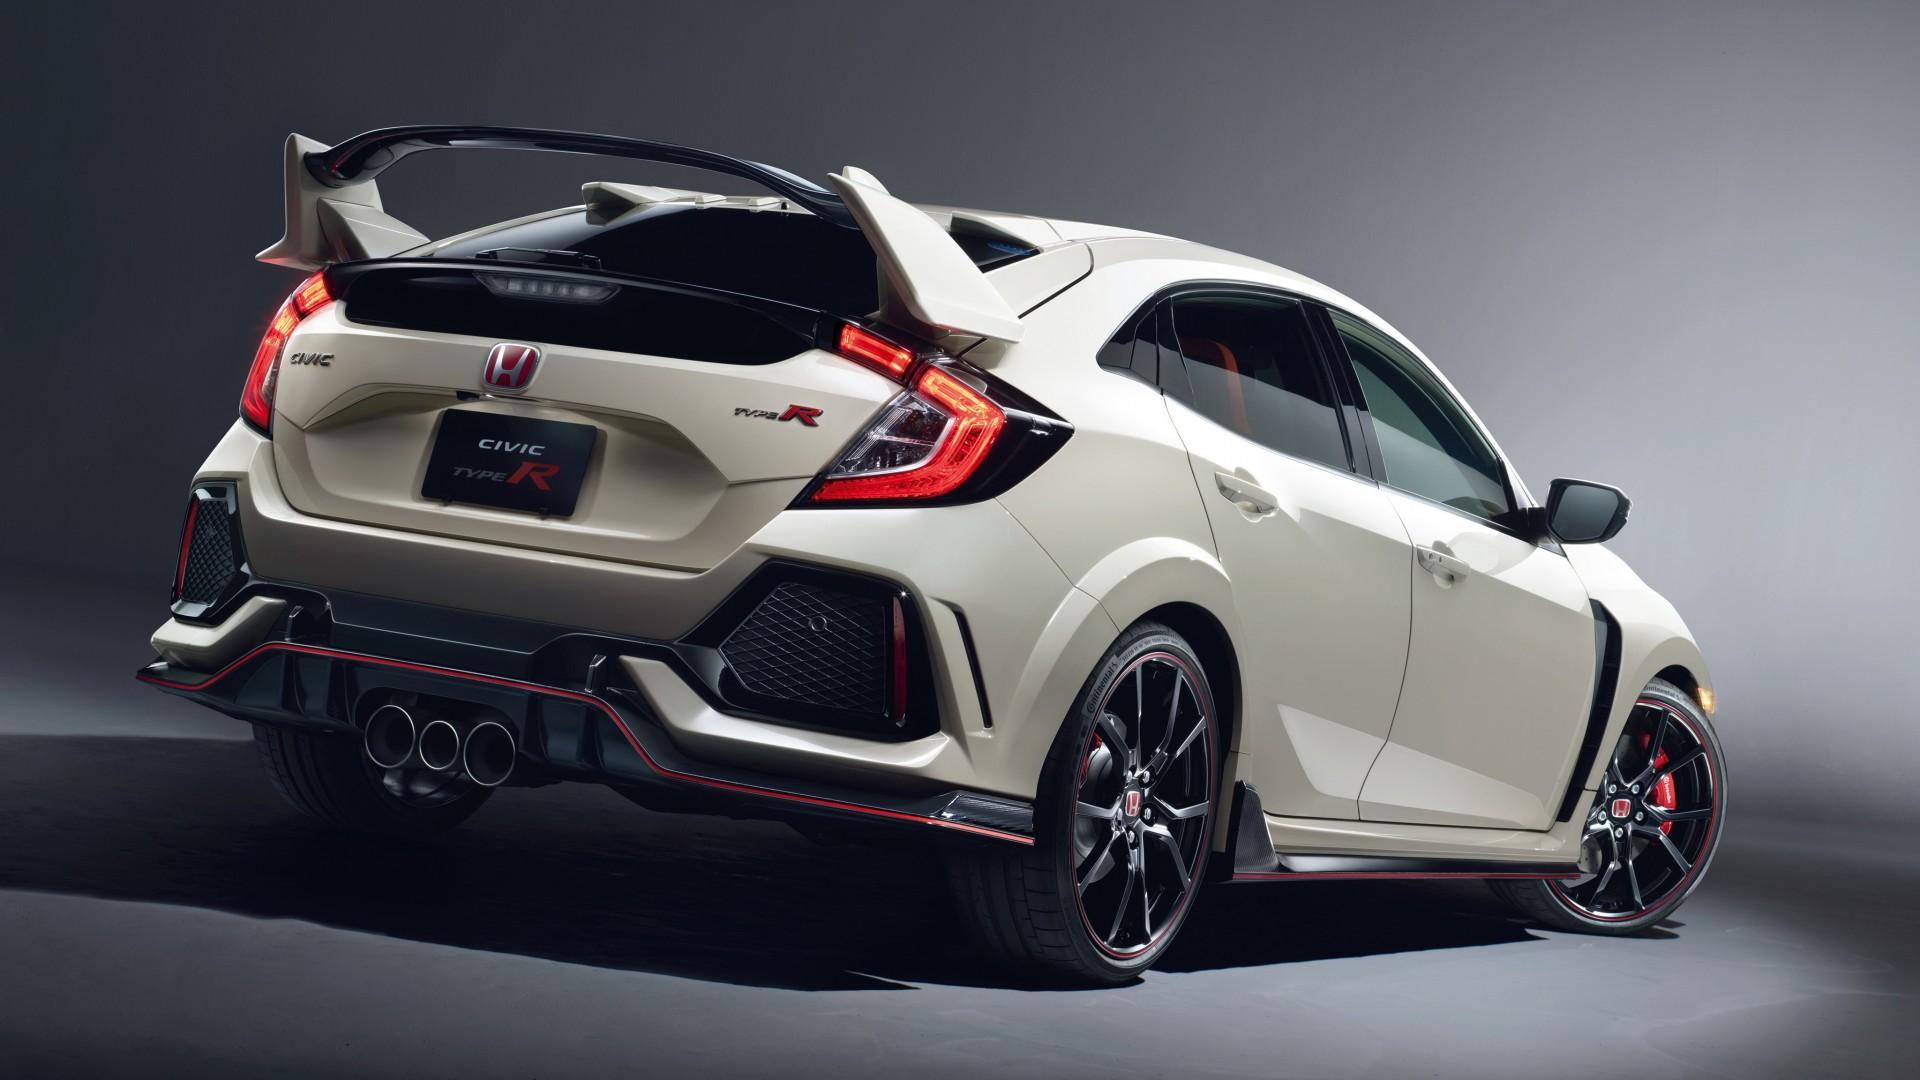 Widescreen Car Wallpapers Hd 2017 Honda Civic Type R 4 Wallpaper Hd Car Wallpapers